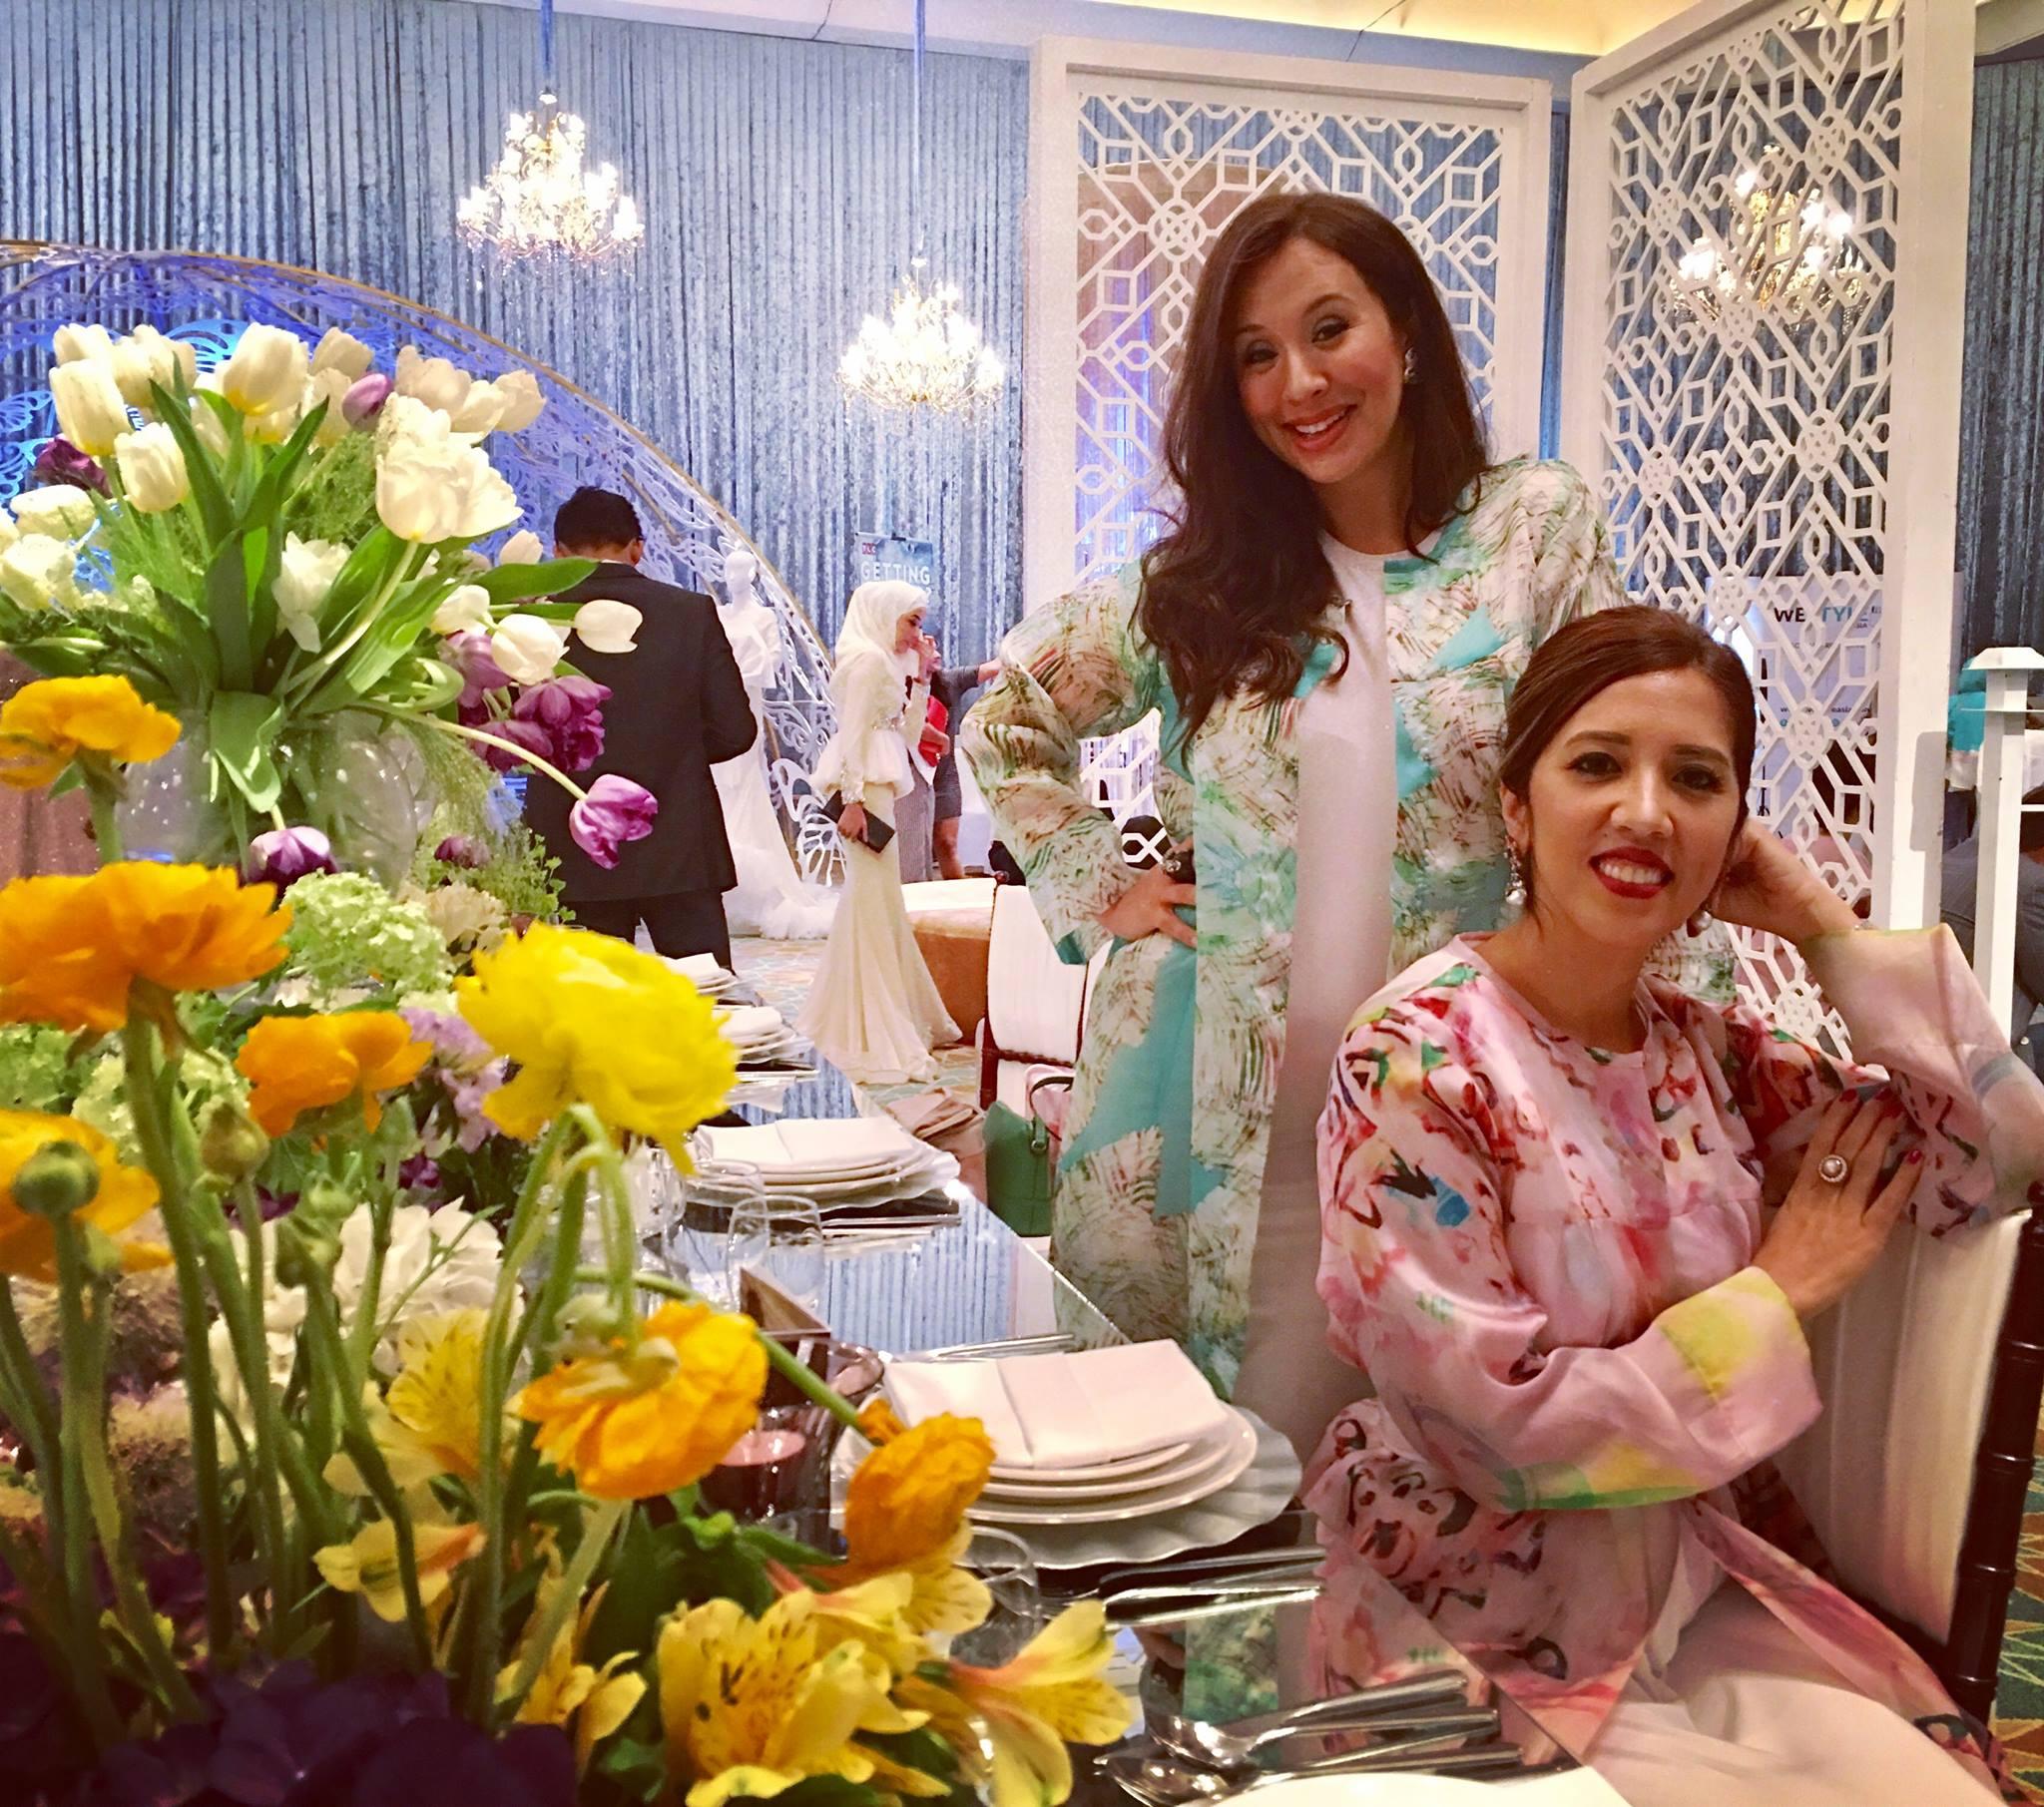 Batik&Bubbles wearing hand-painted batik outfits from Cosry Couture and Jewels courtesy of Lotus Arts de Vivre.